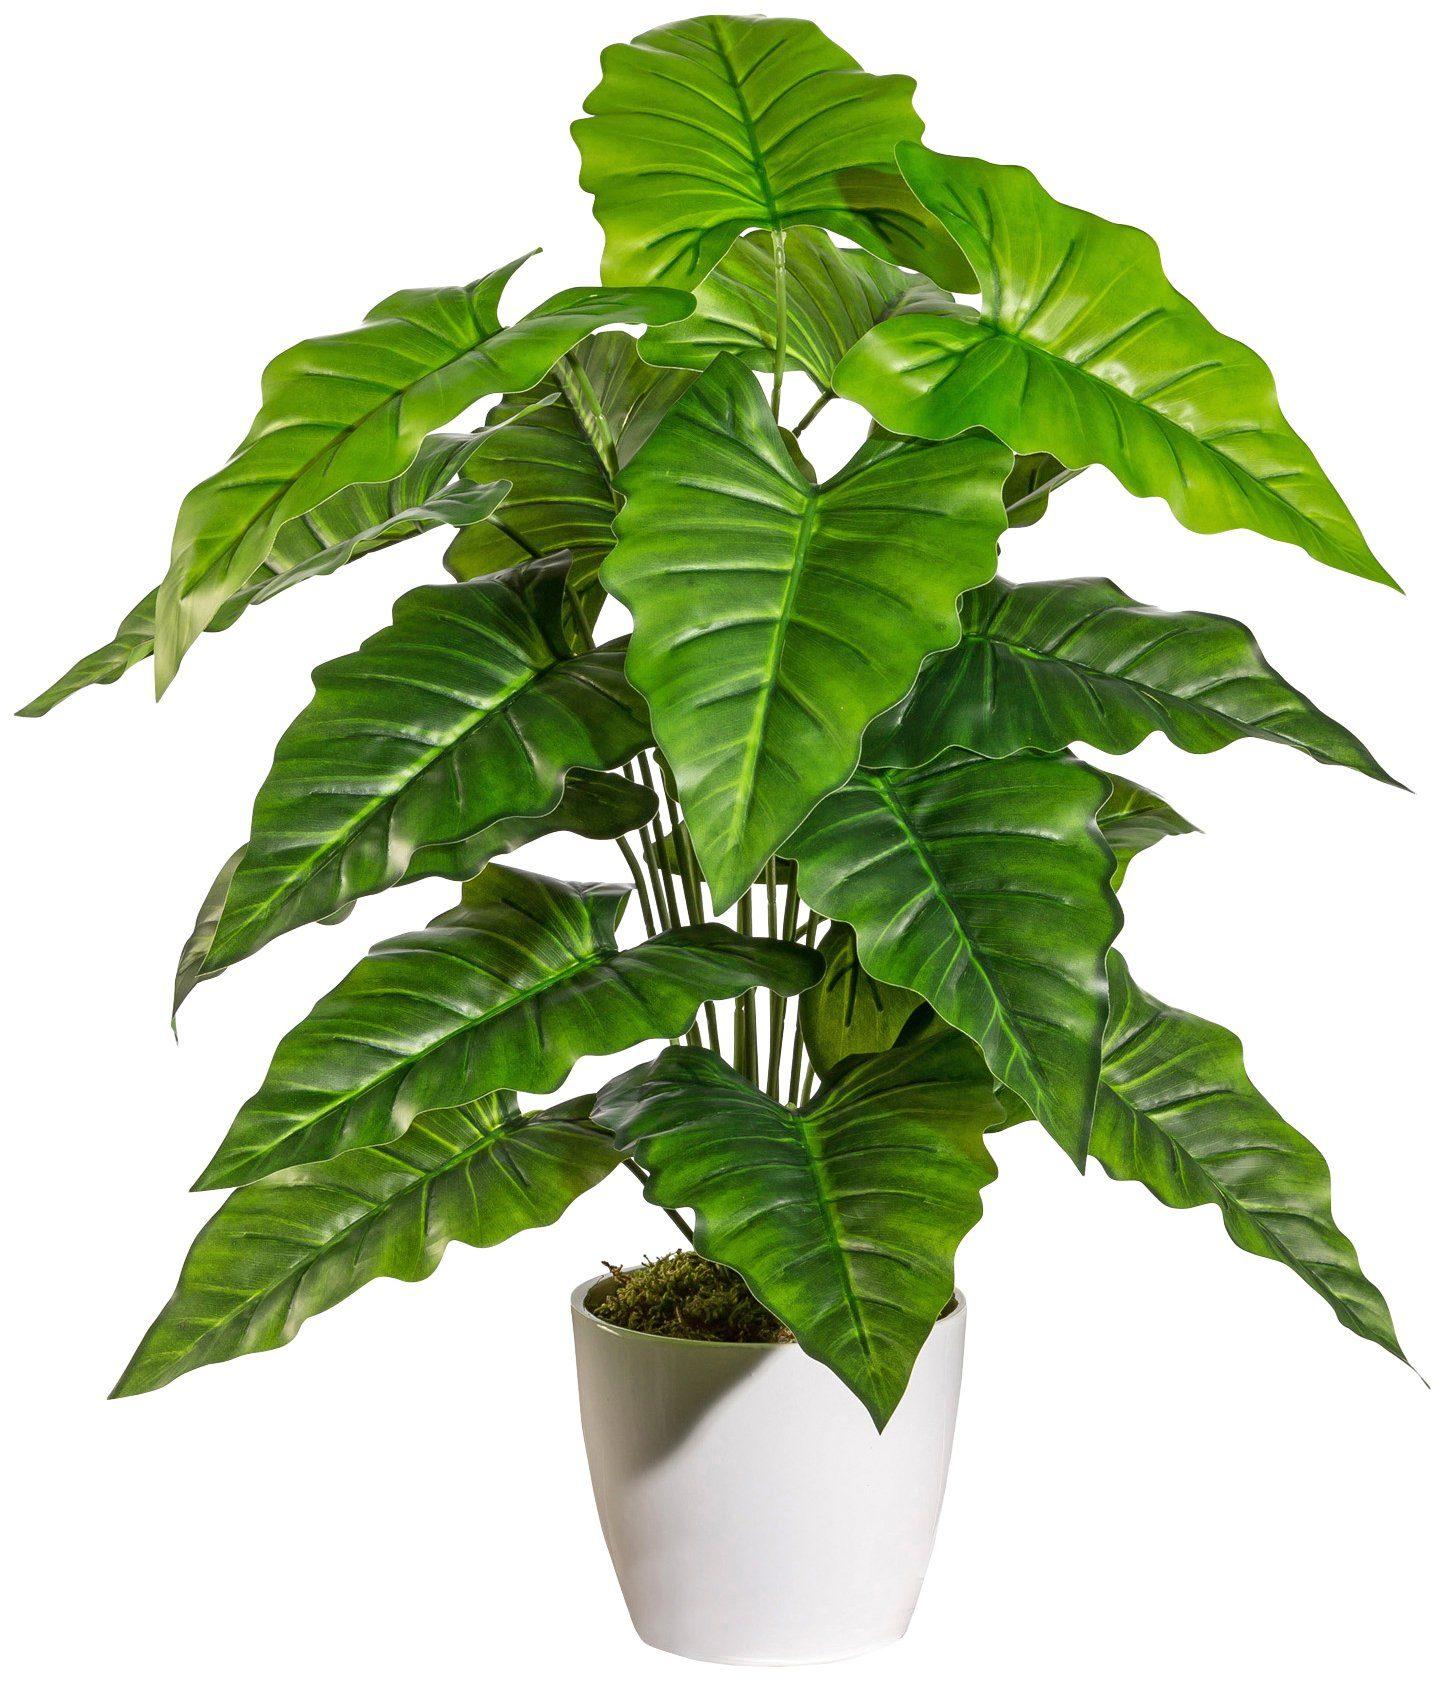 Kunstpflanze »Anthurium«, im Keramiktopf mit Moos, Höhe 60 cm